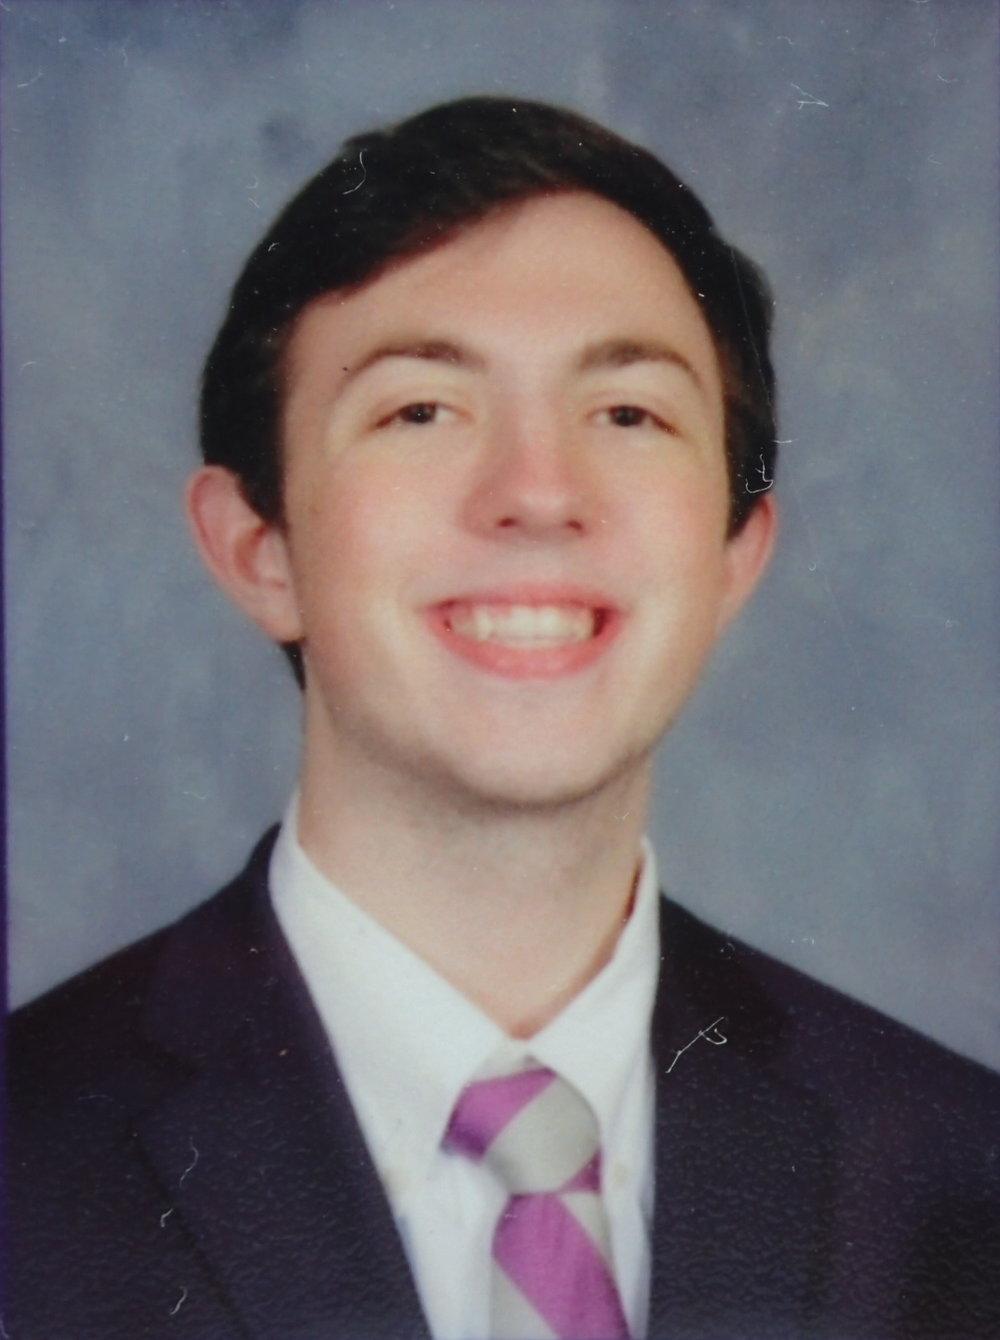 Ryan Sukenik, Secretary '20 - Classification: JuniorMajor: Politcal ScienceHometown: Dallas, TexasEmail:rsukenik1@tamu.edu